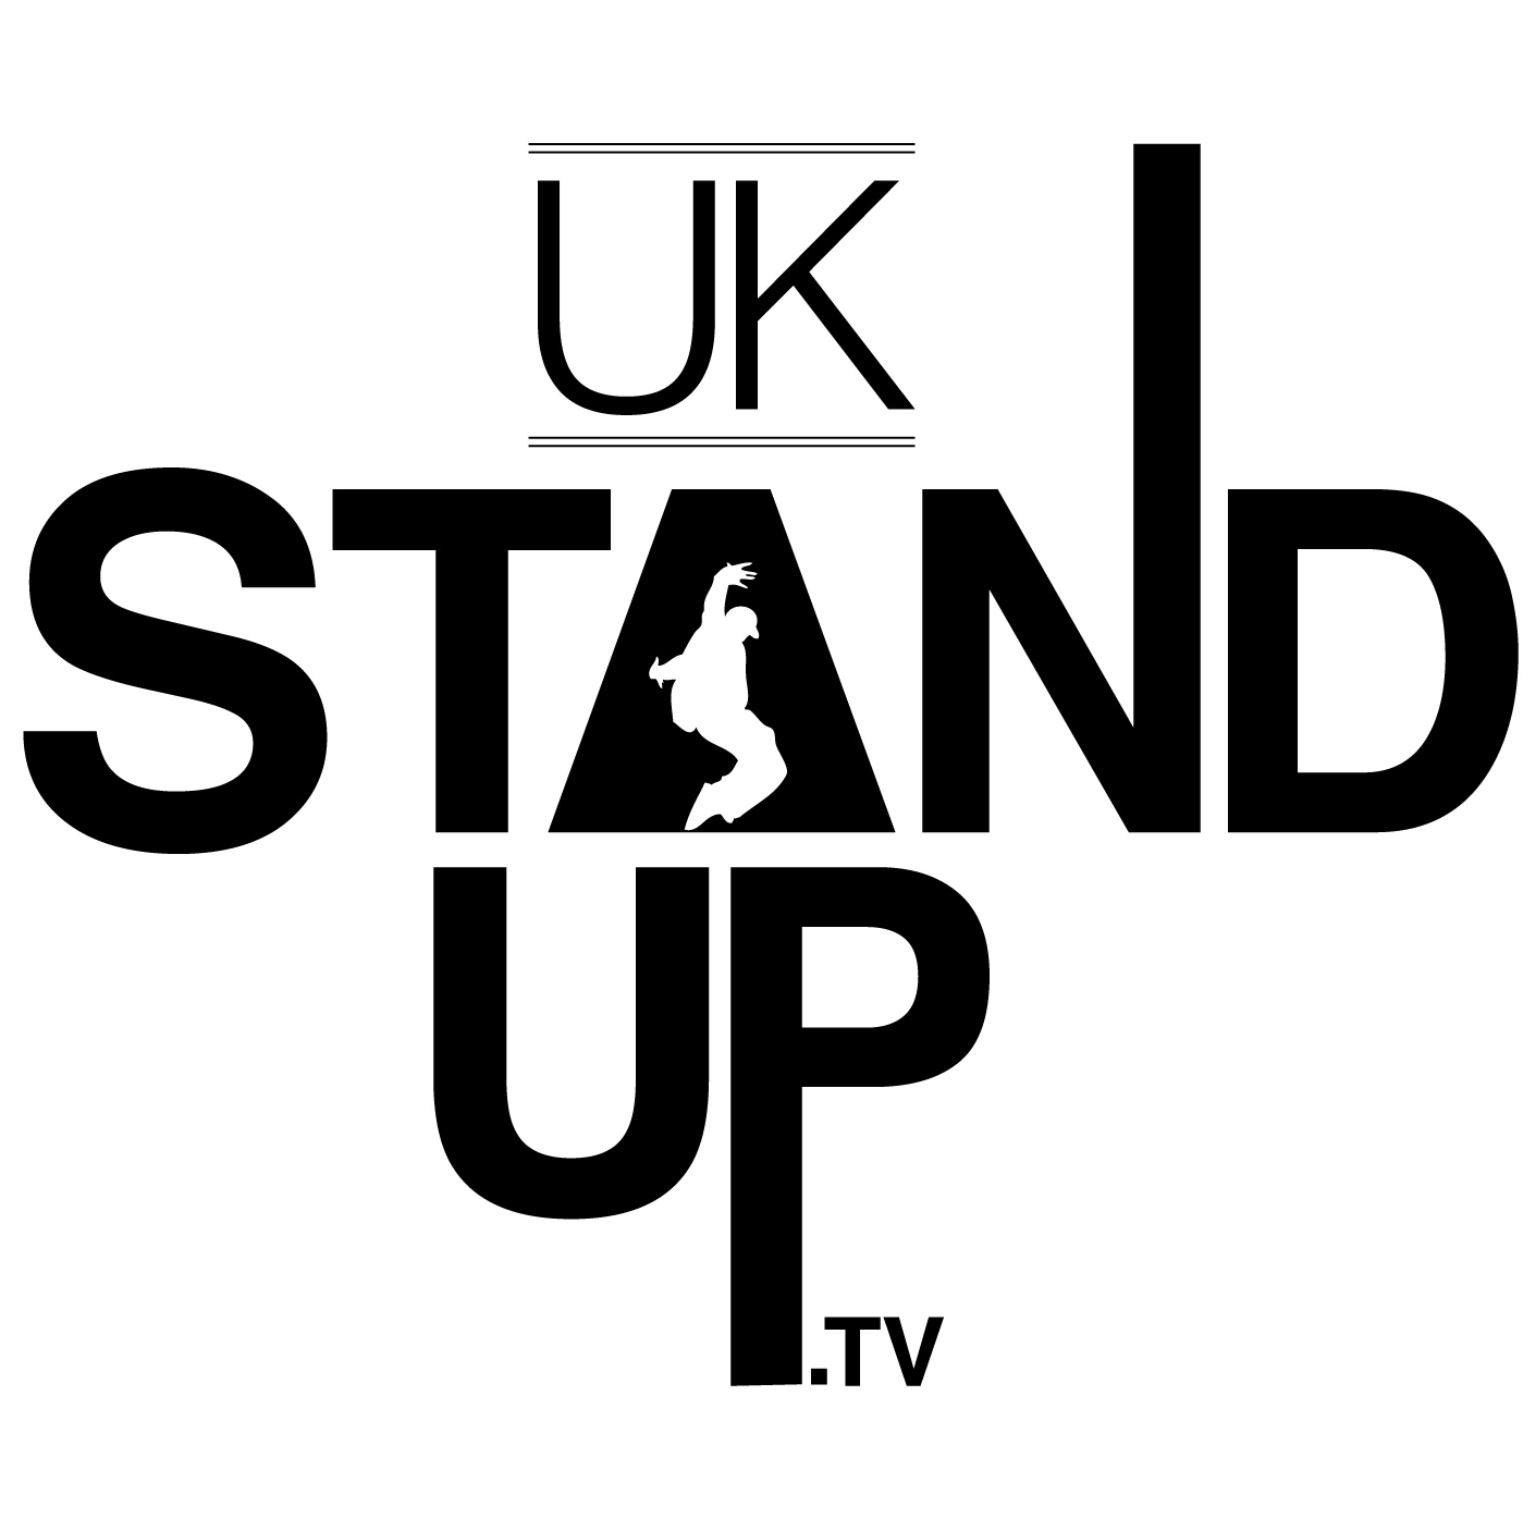 A logo I designed for dance event company Uk Stand Up TV